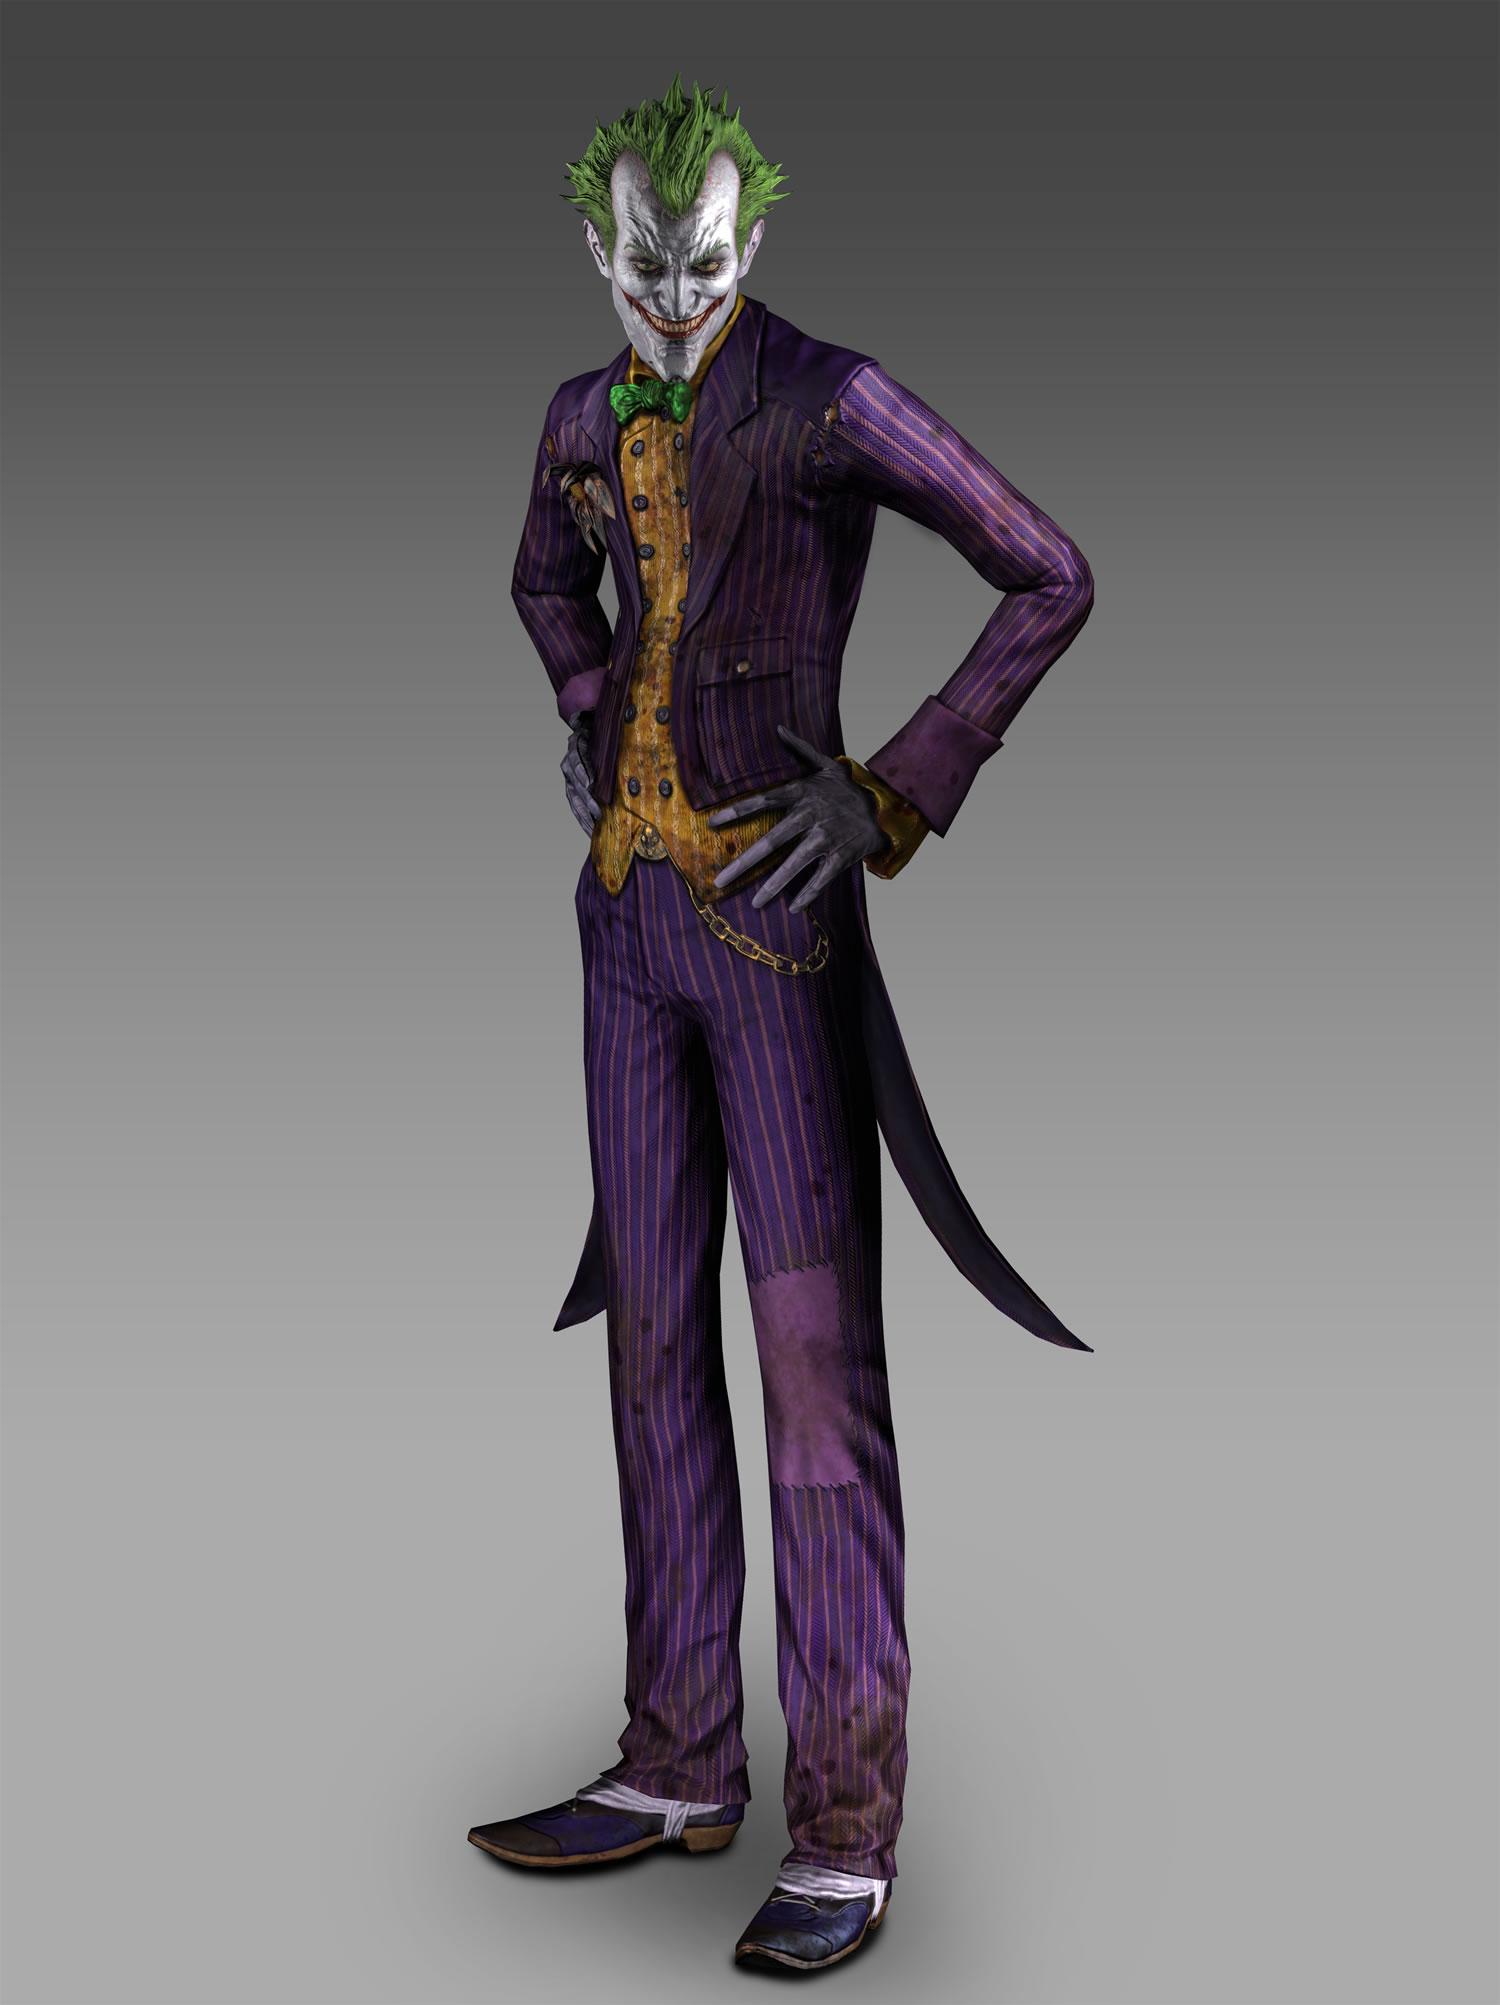 Modelado Cabeza de Joker en cera. Videos